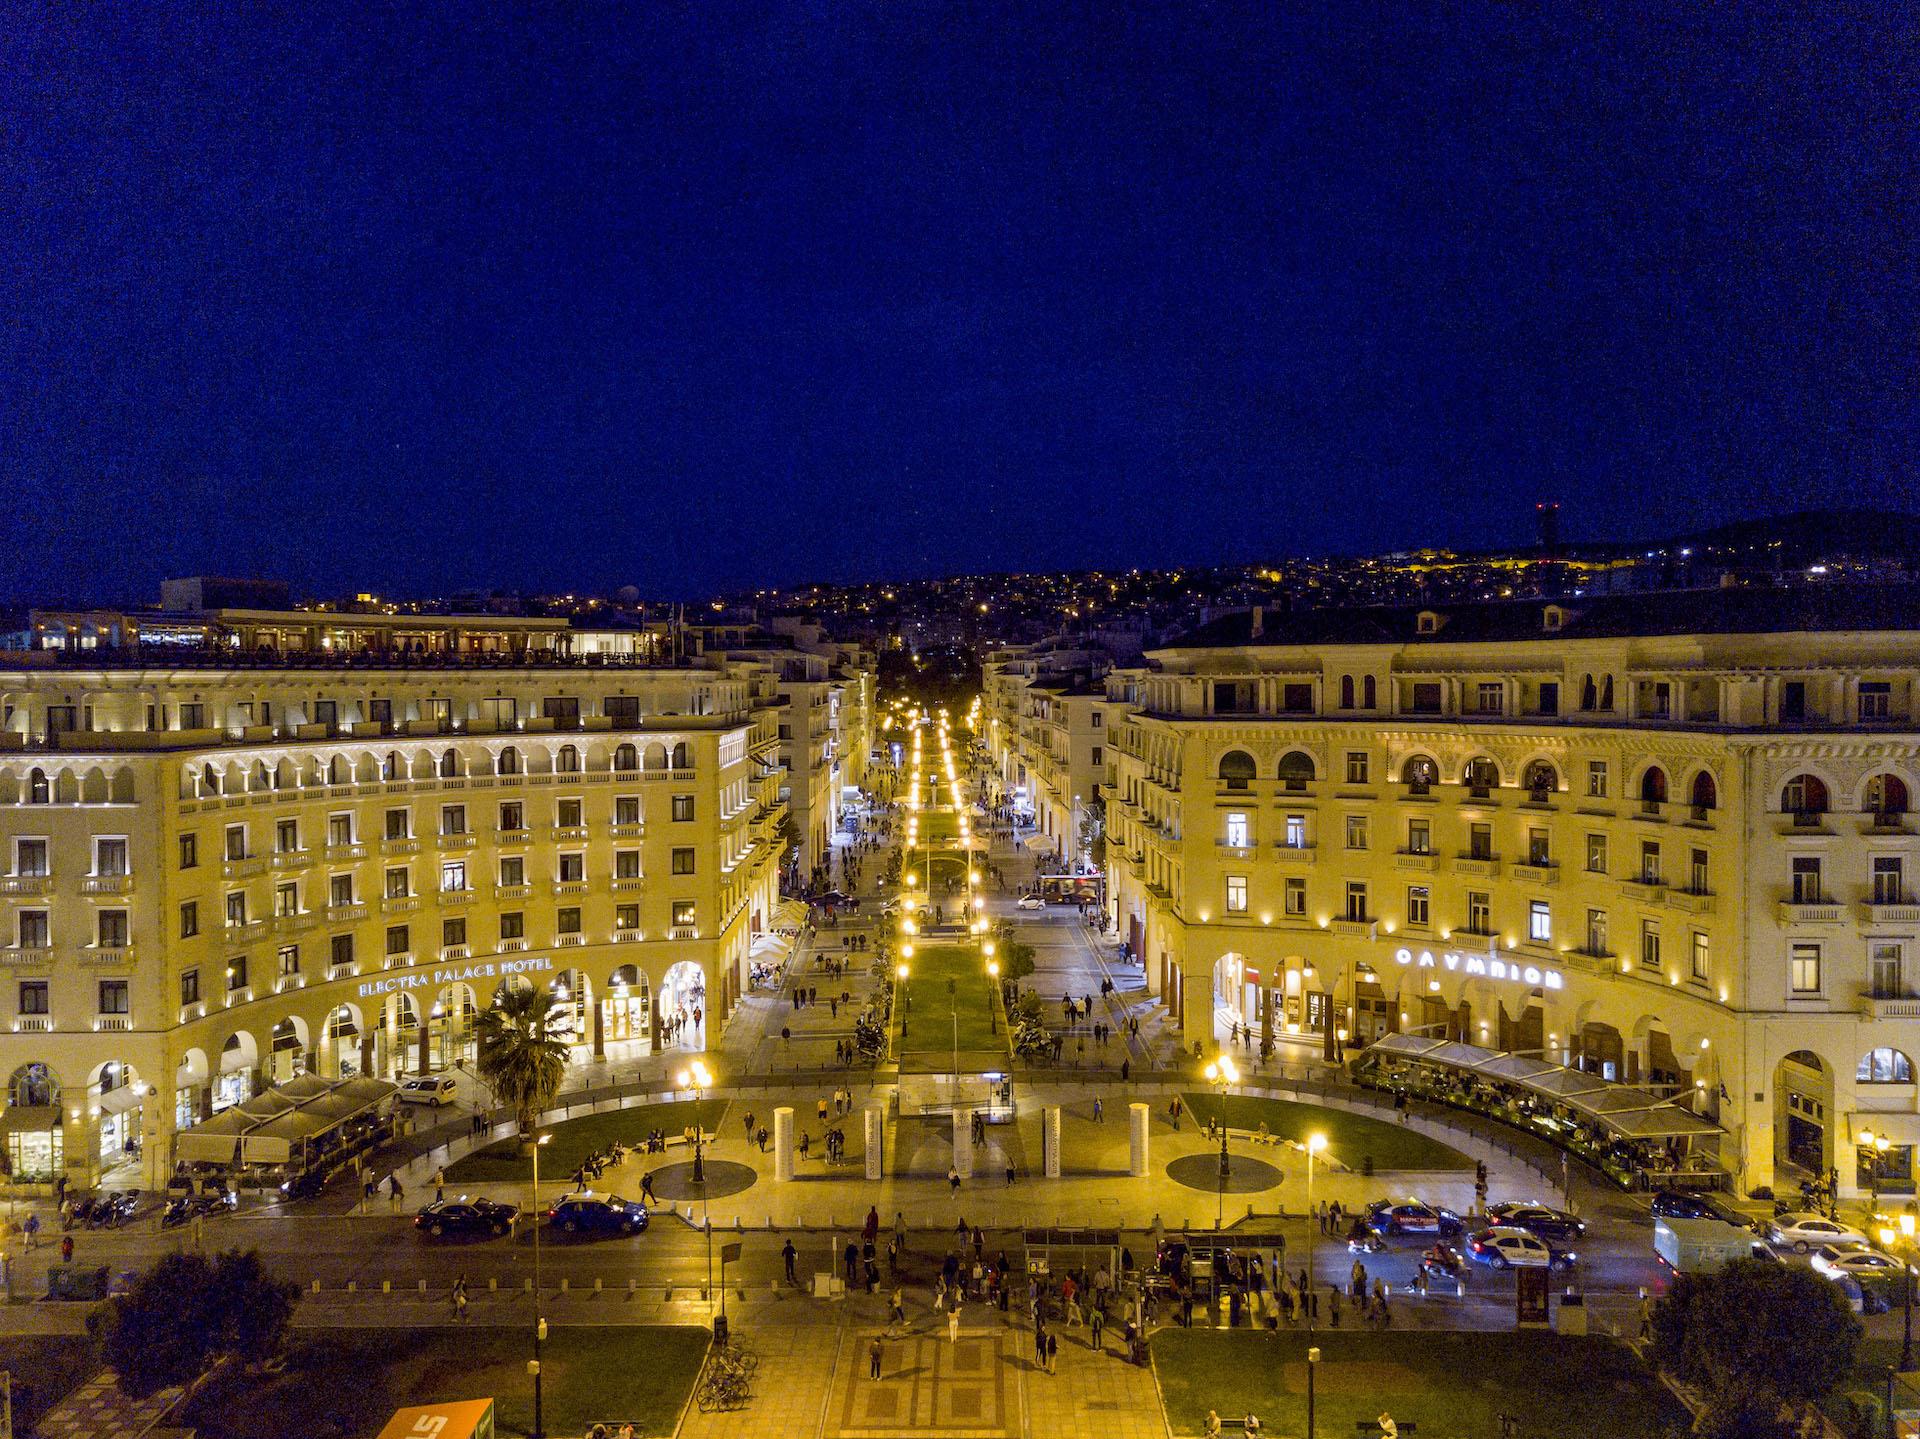 Thessaloniki-Aristotelous-Square-by-night